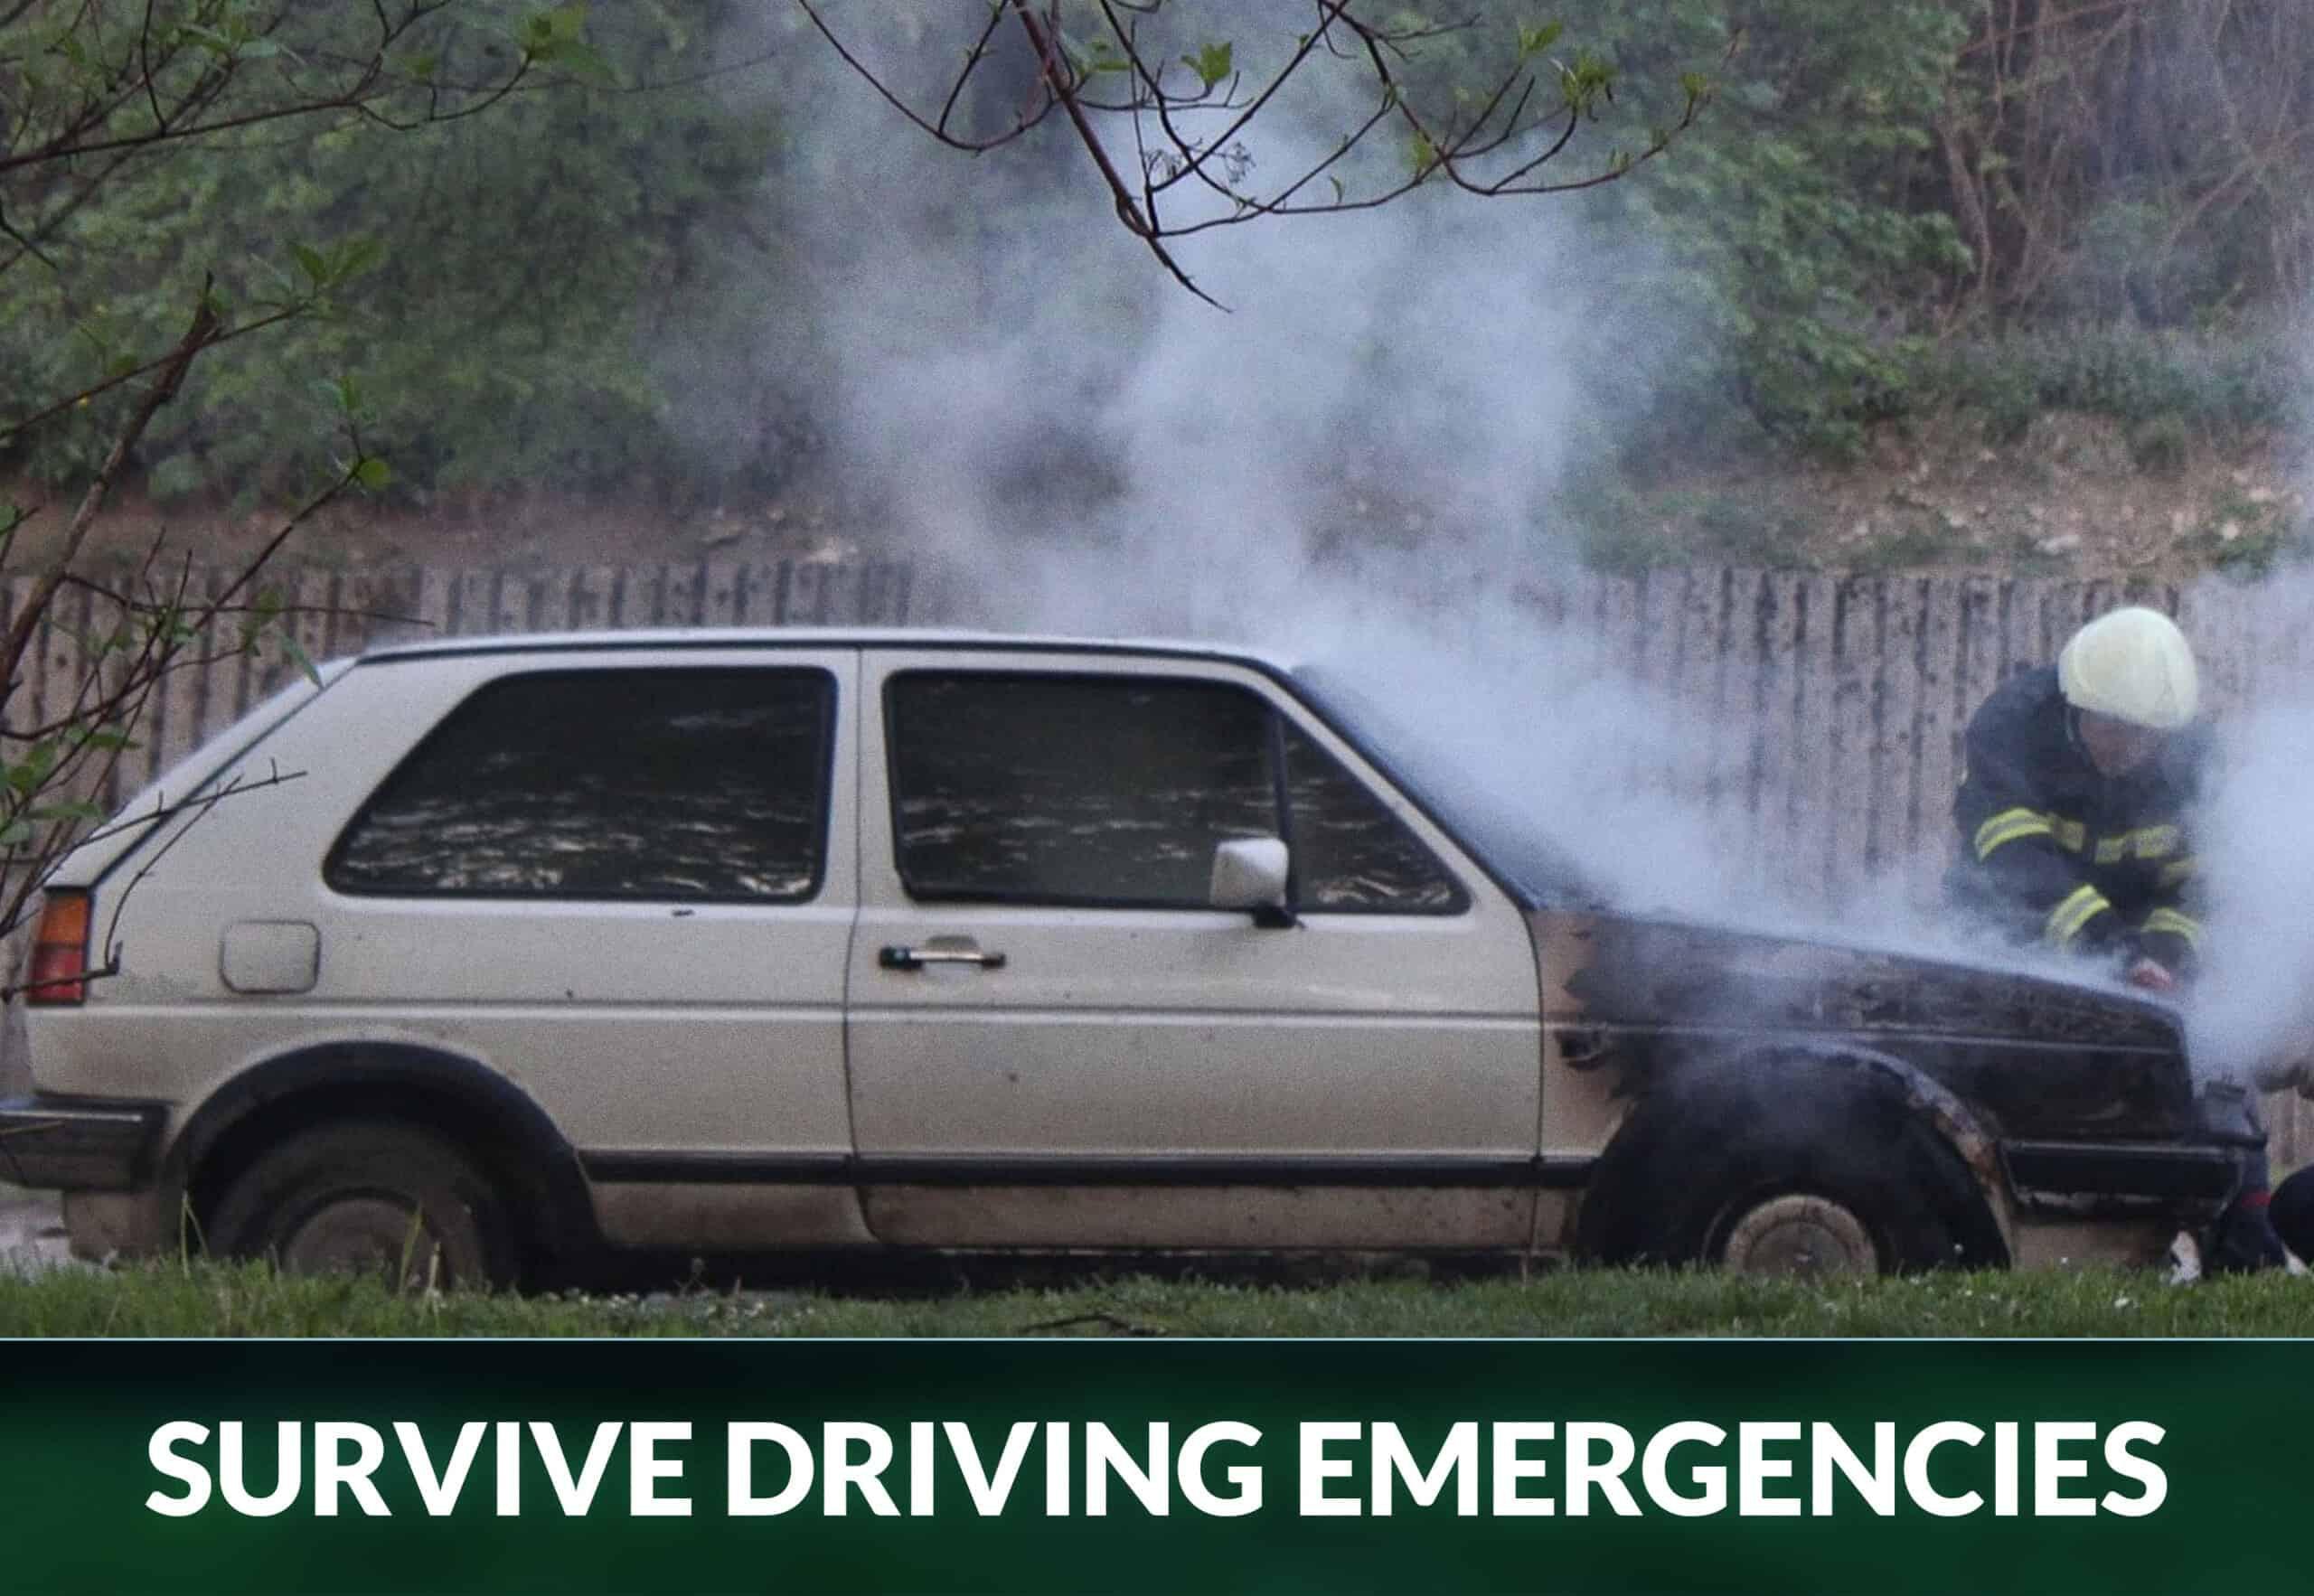 SURVIVE DRIVING EMERGENCIES